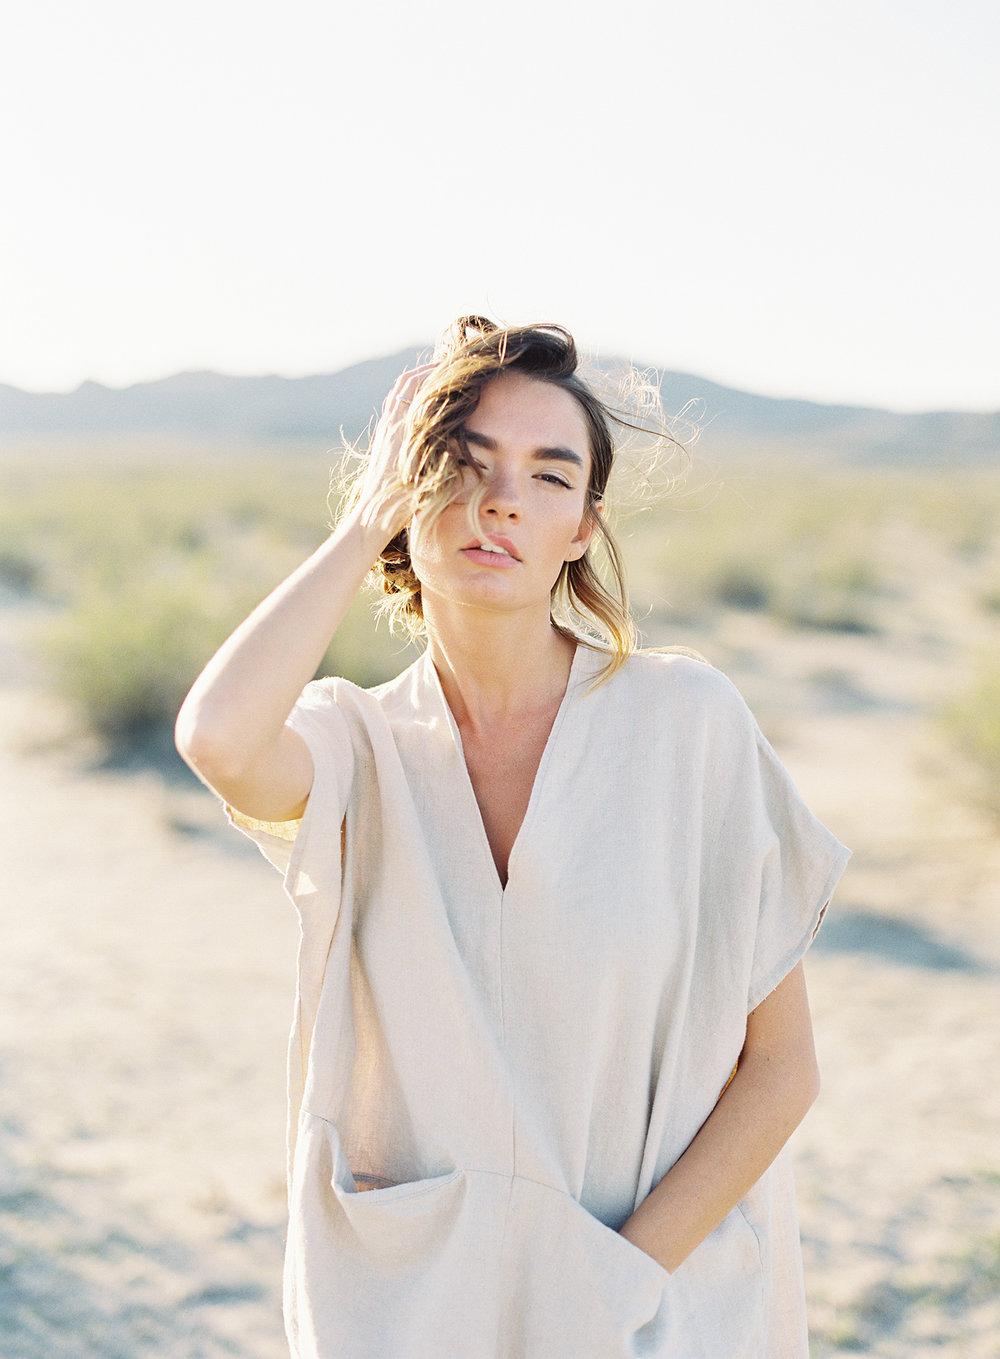 desert-fashion-8.jpg